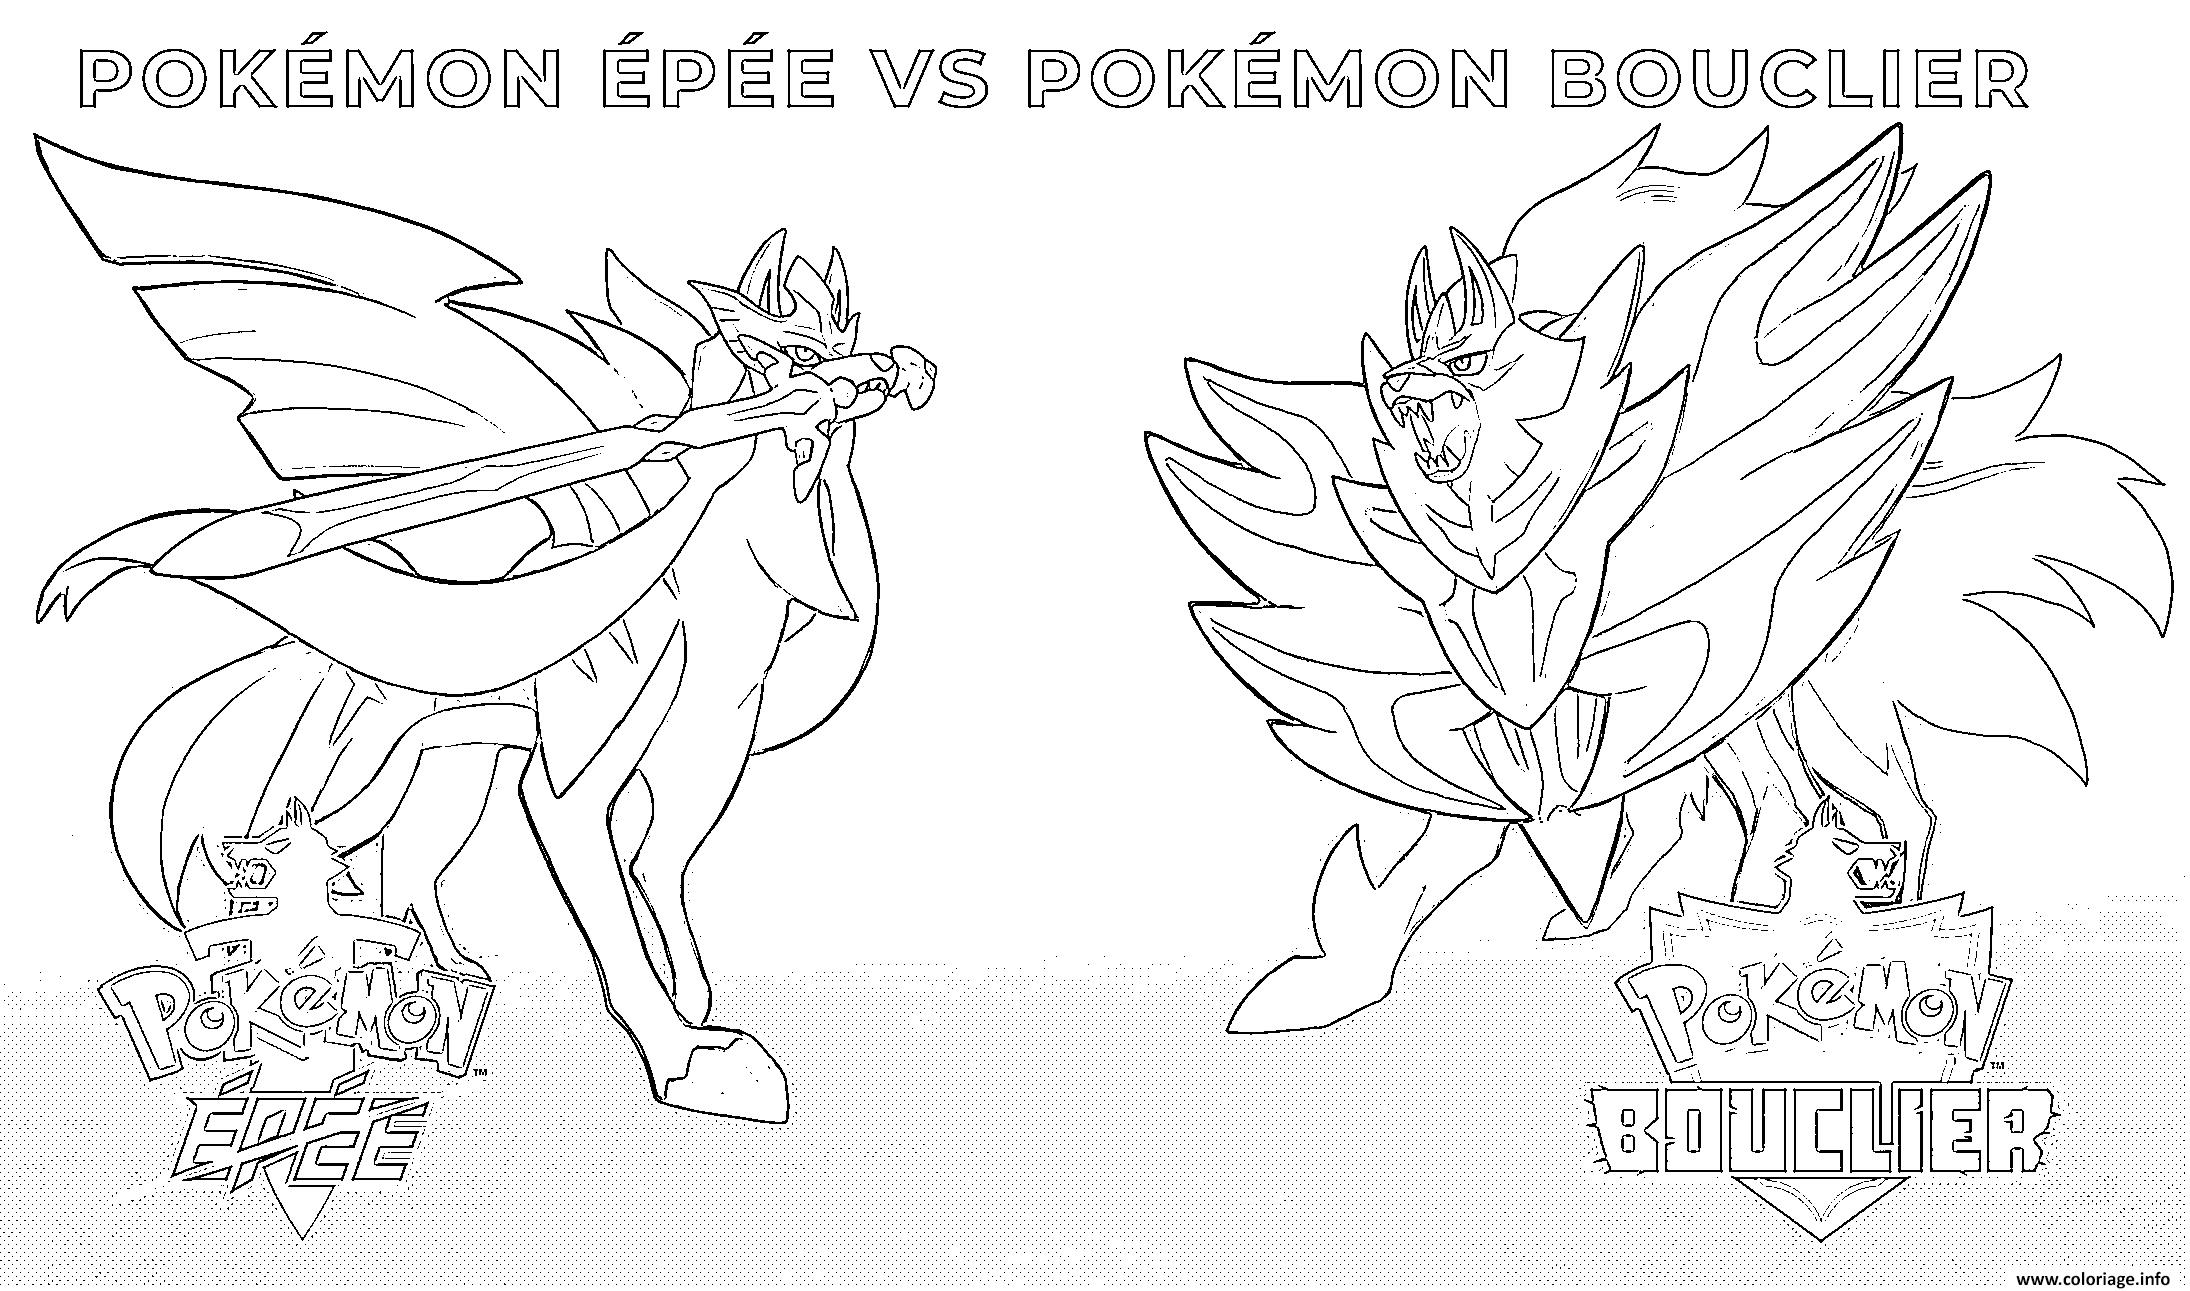 Coloriage Pokemon Epee Pokemon Bouclier 2019 Jecolorie Com